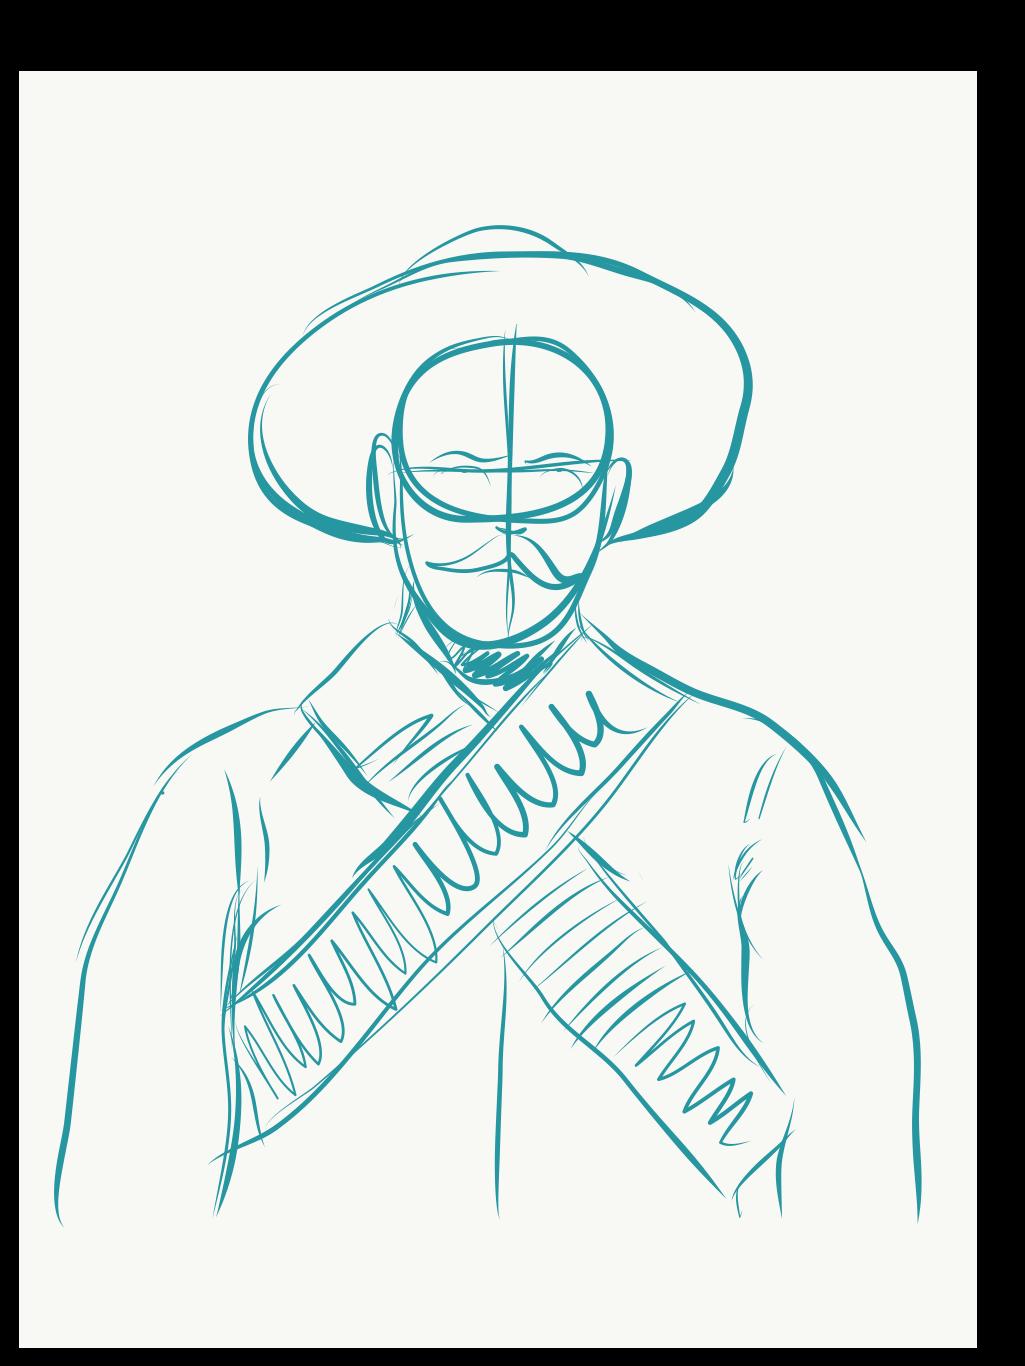 1025x1366 Pancho Villa By Antonio Romero On Behance